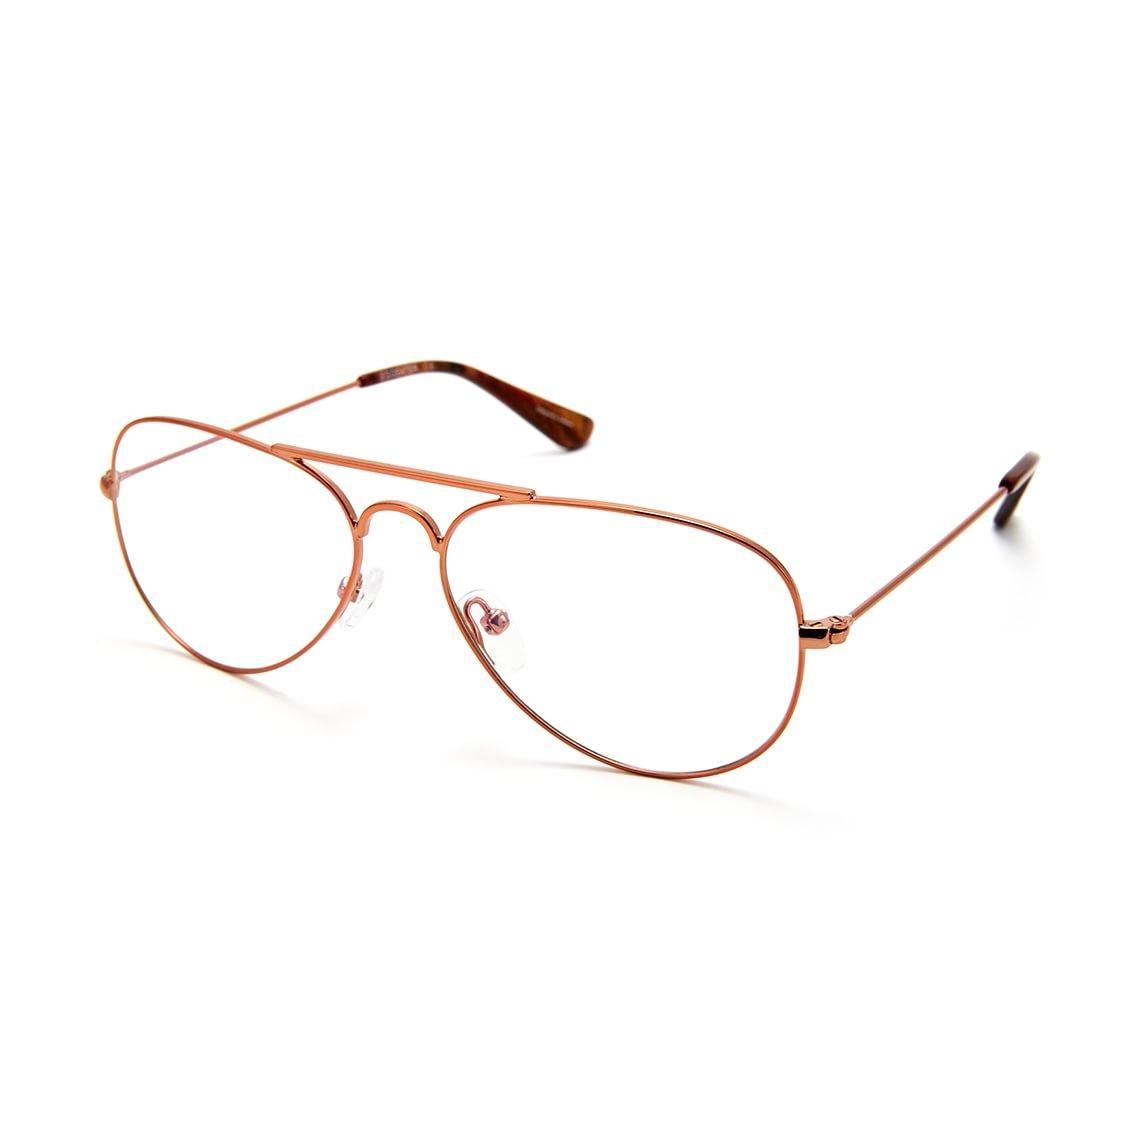 glasögon rabatt barn